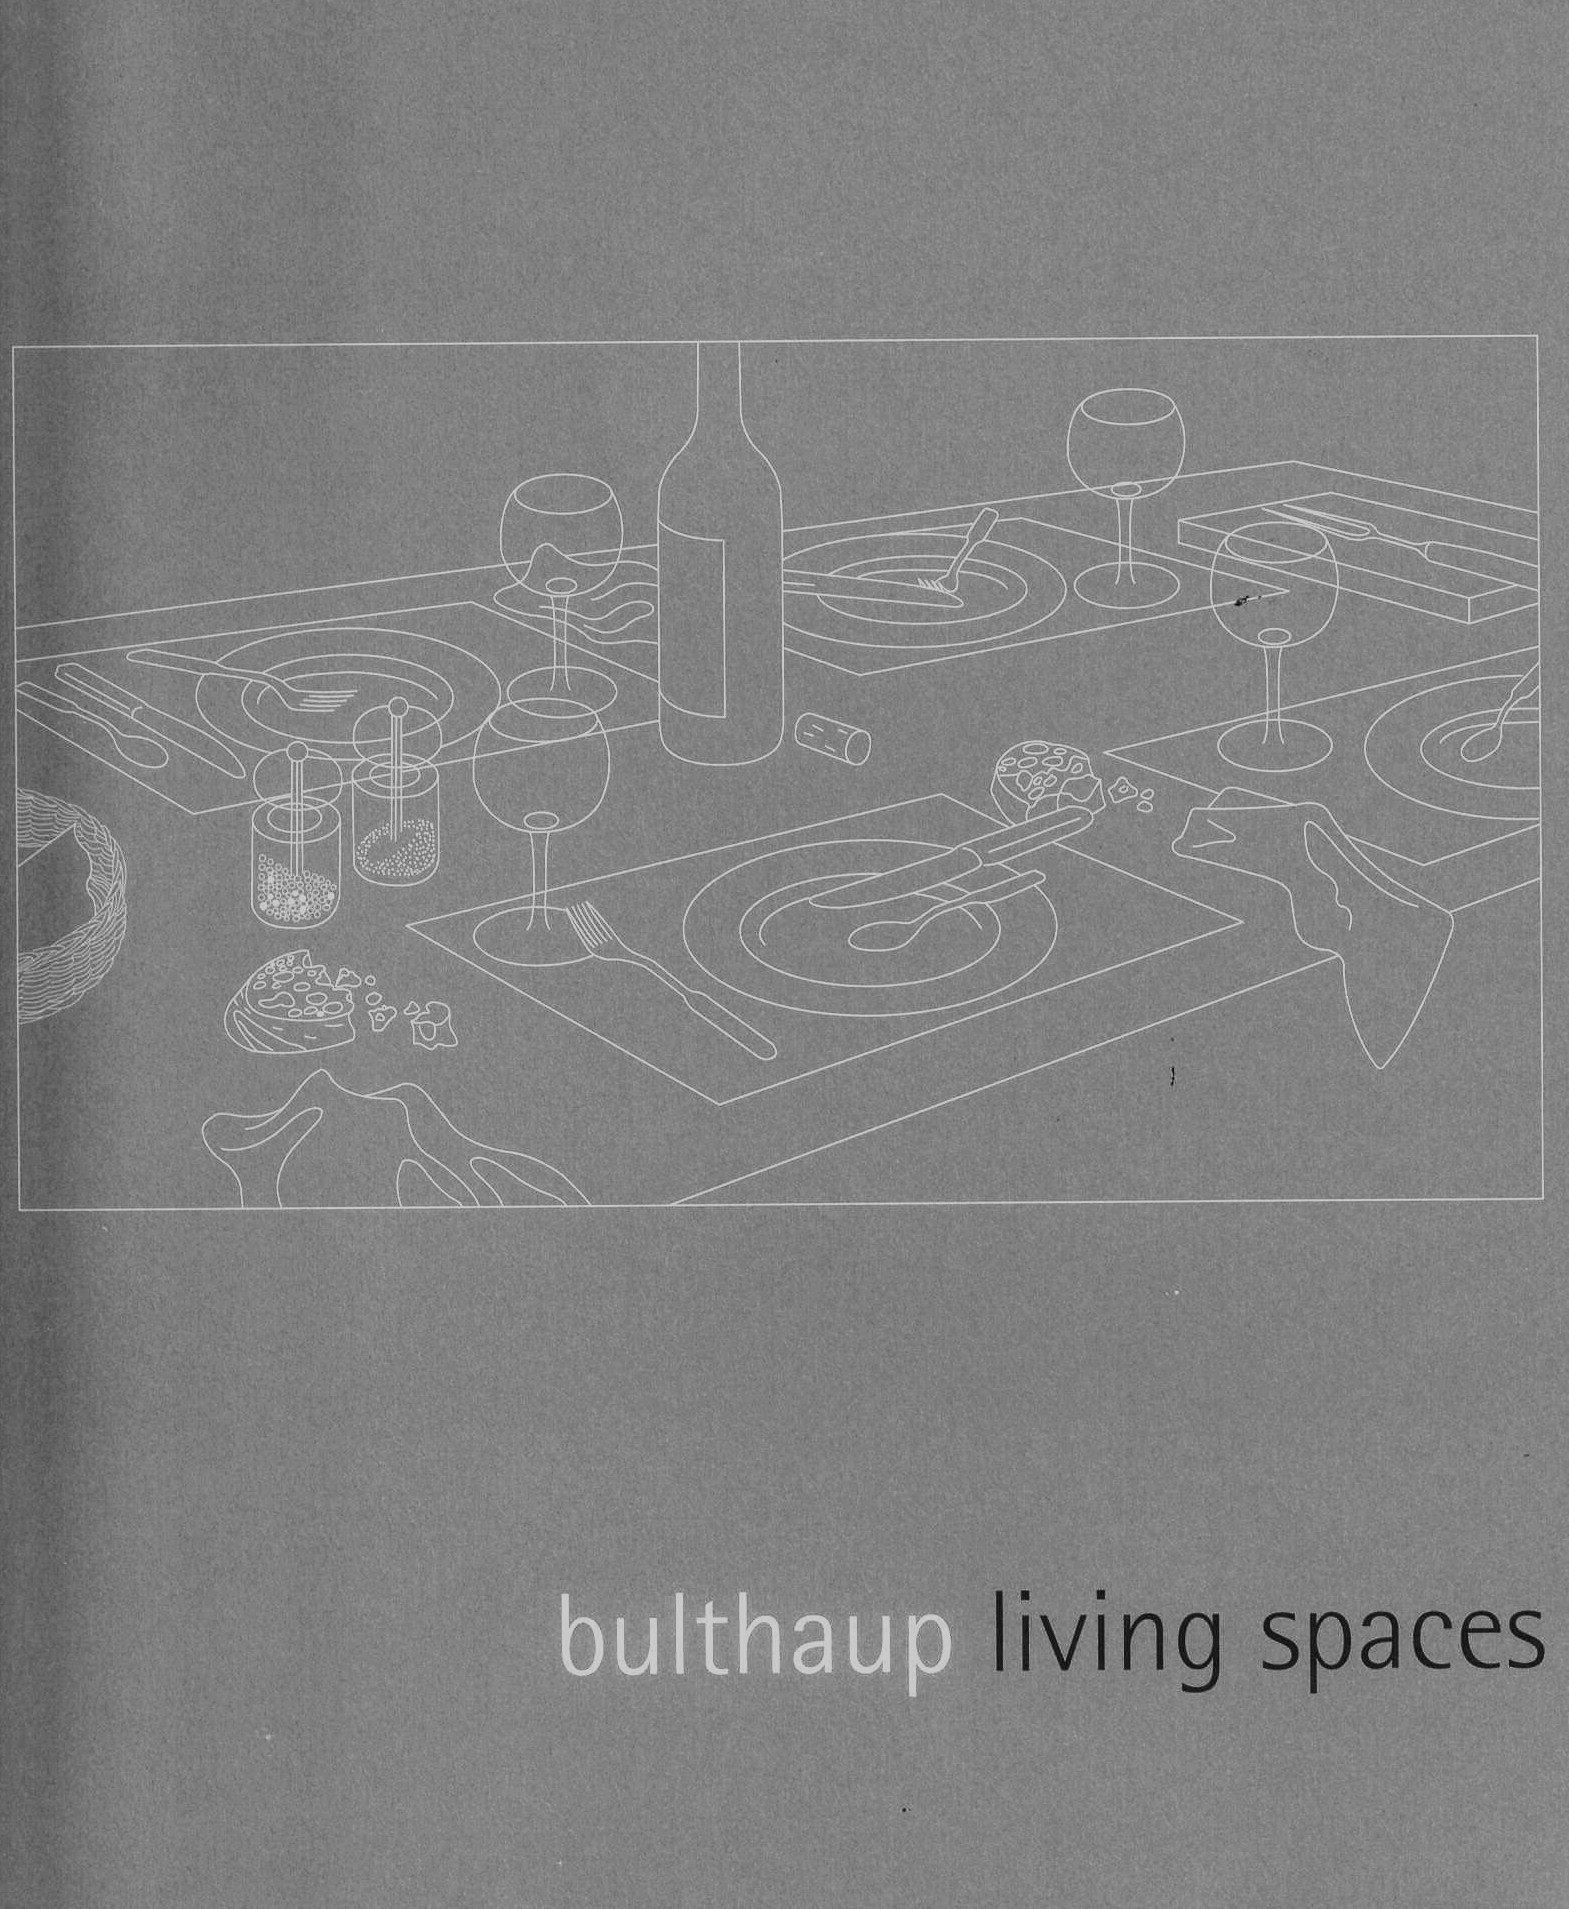 Bulthaup Bodenkirchen bulthaup living spaces bulthaup firm amazon com books